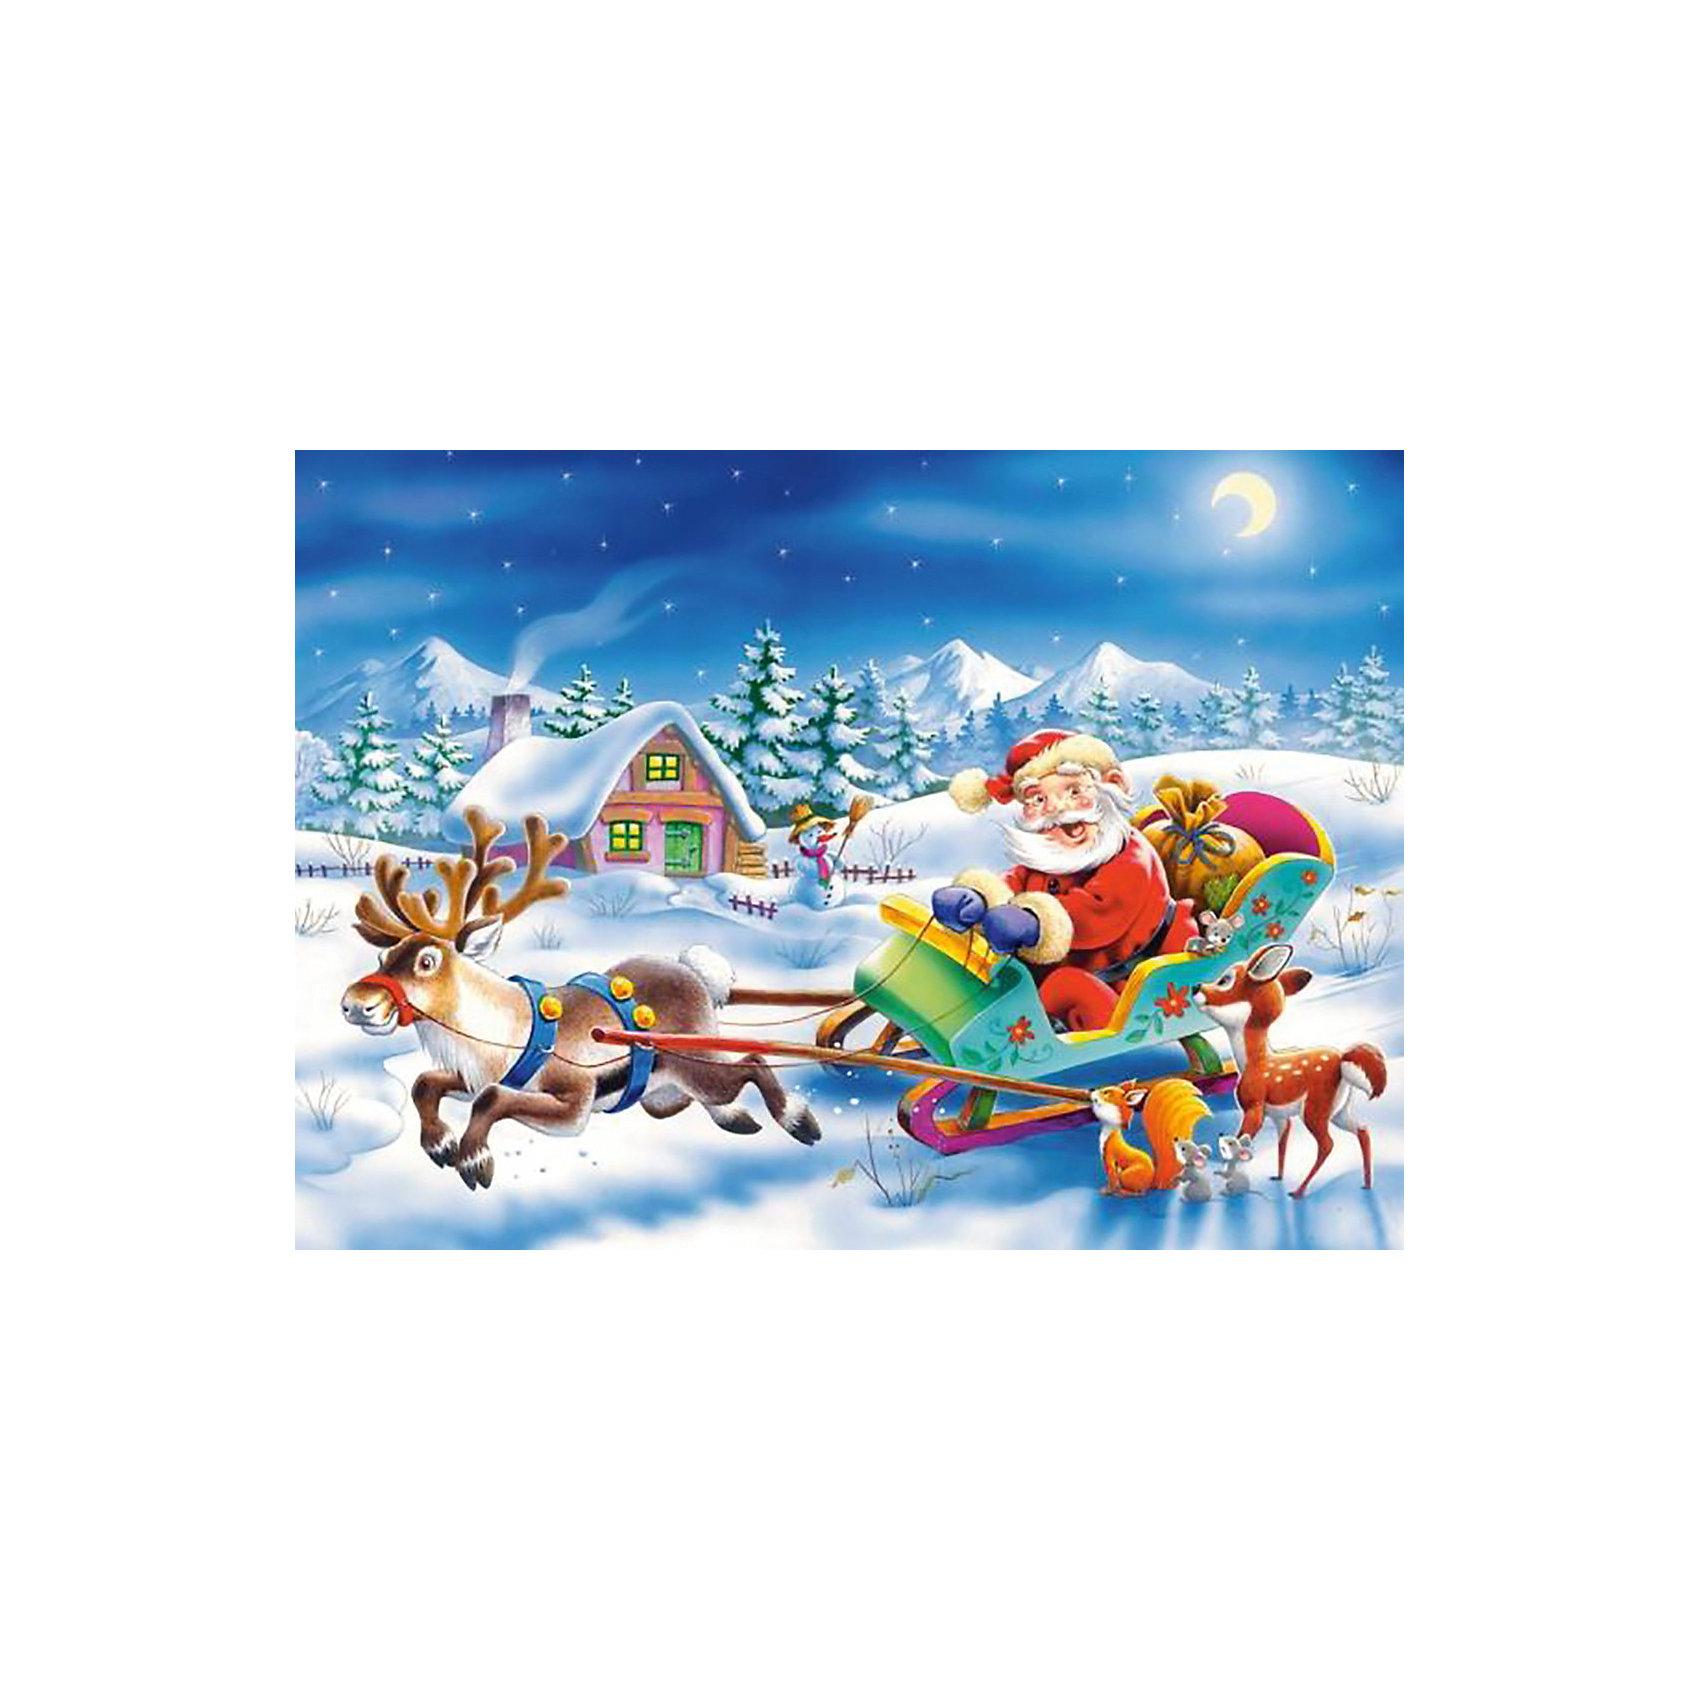 Castorland Пазл Рождество, 260 деталей , Castorland castorland пазл красная шапочка castorland 20 деталей